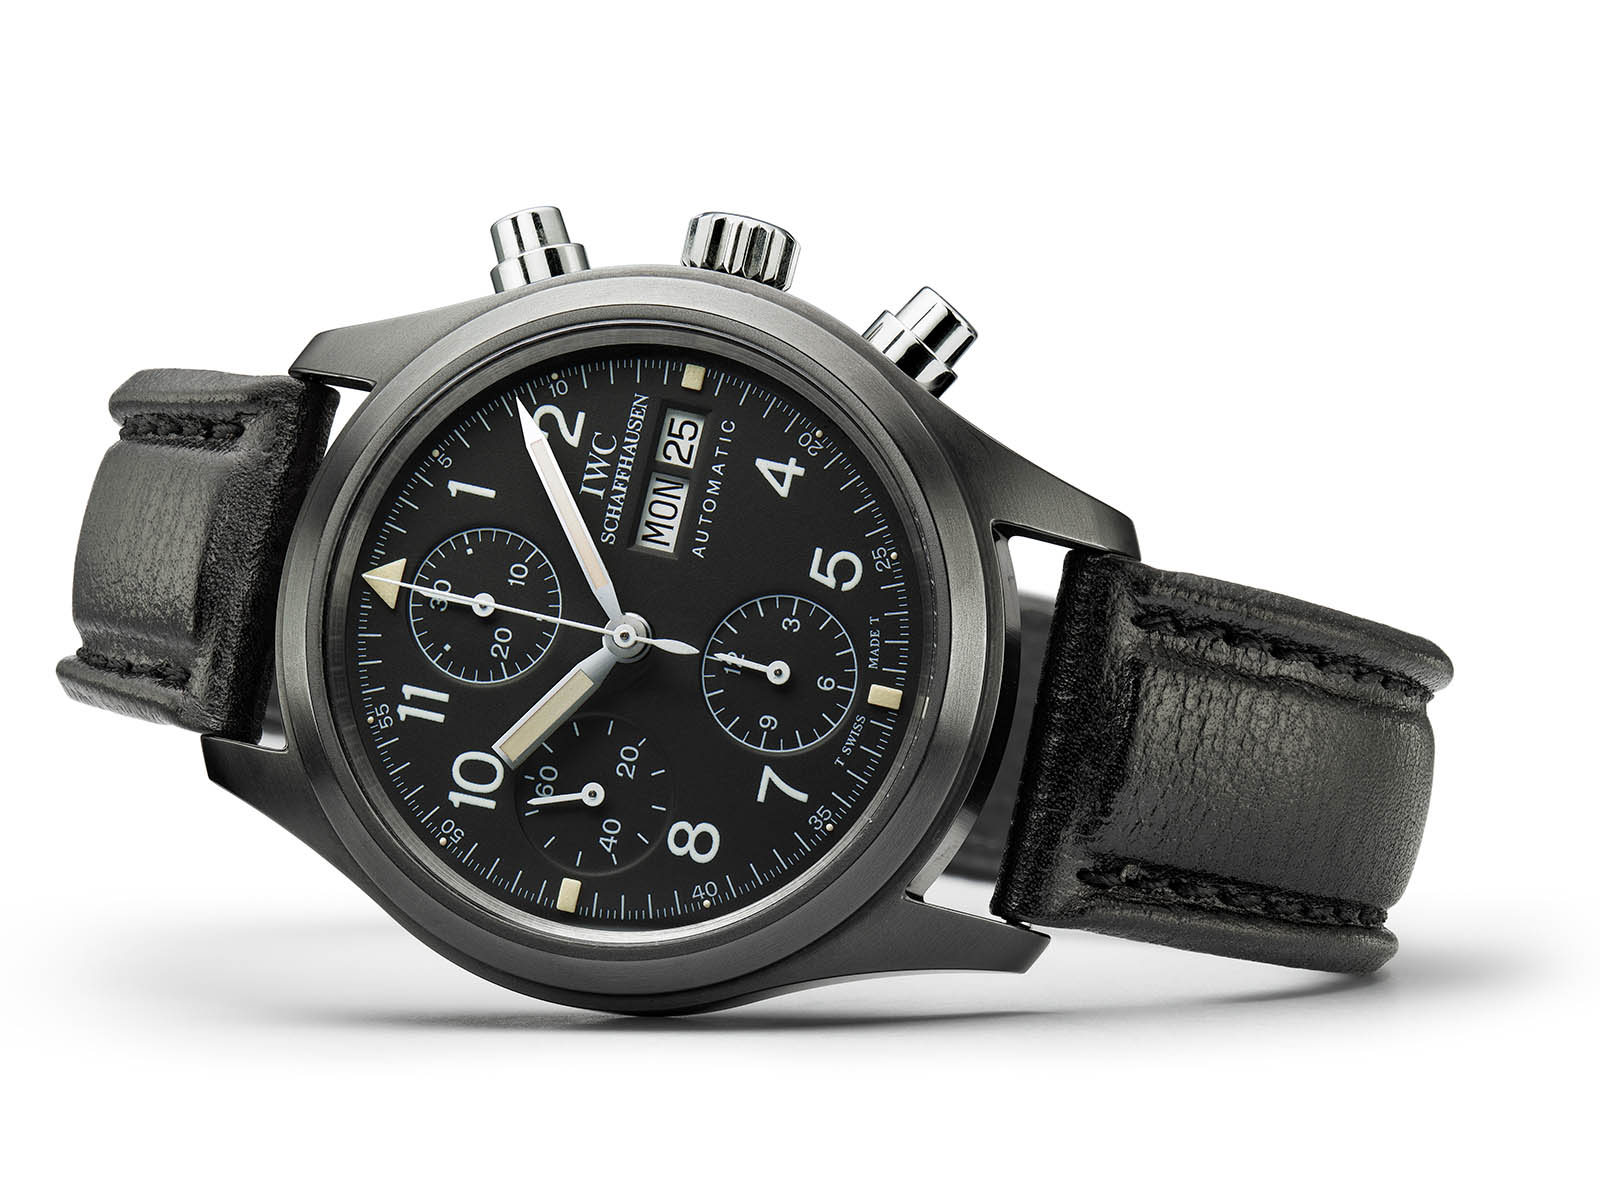 iw387905-iwc-pilot-s-chronograph-tribute-to-3705-5.jpg